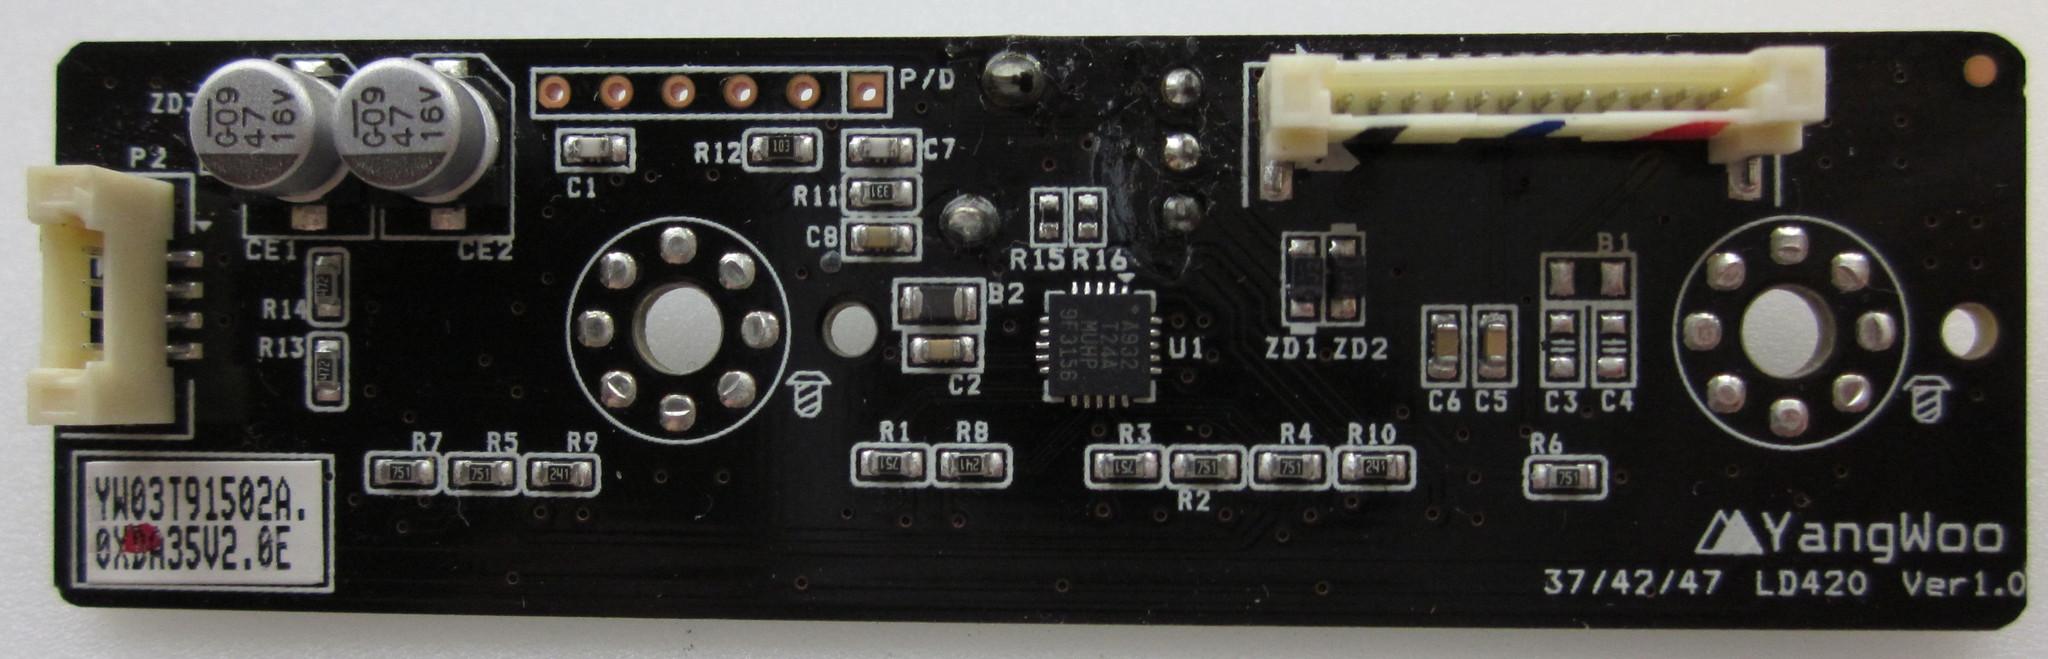 37/42/47 LD420 Ver1.0